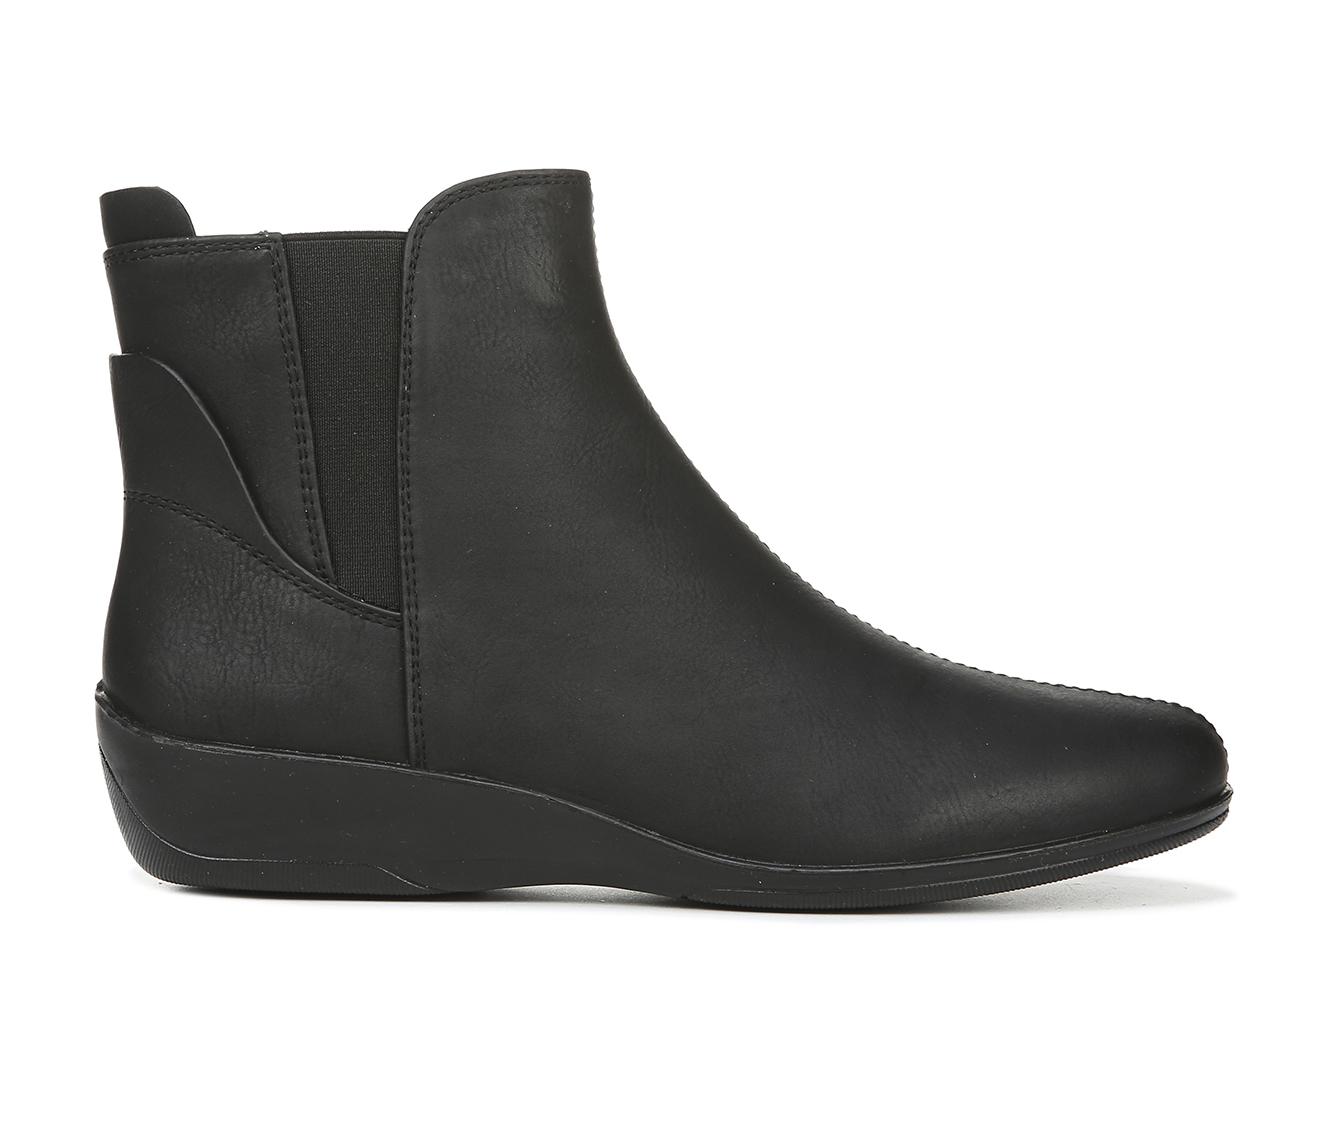 LifeStride Izzy Women's Boots (Black - Faux Leather)